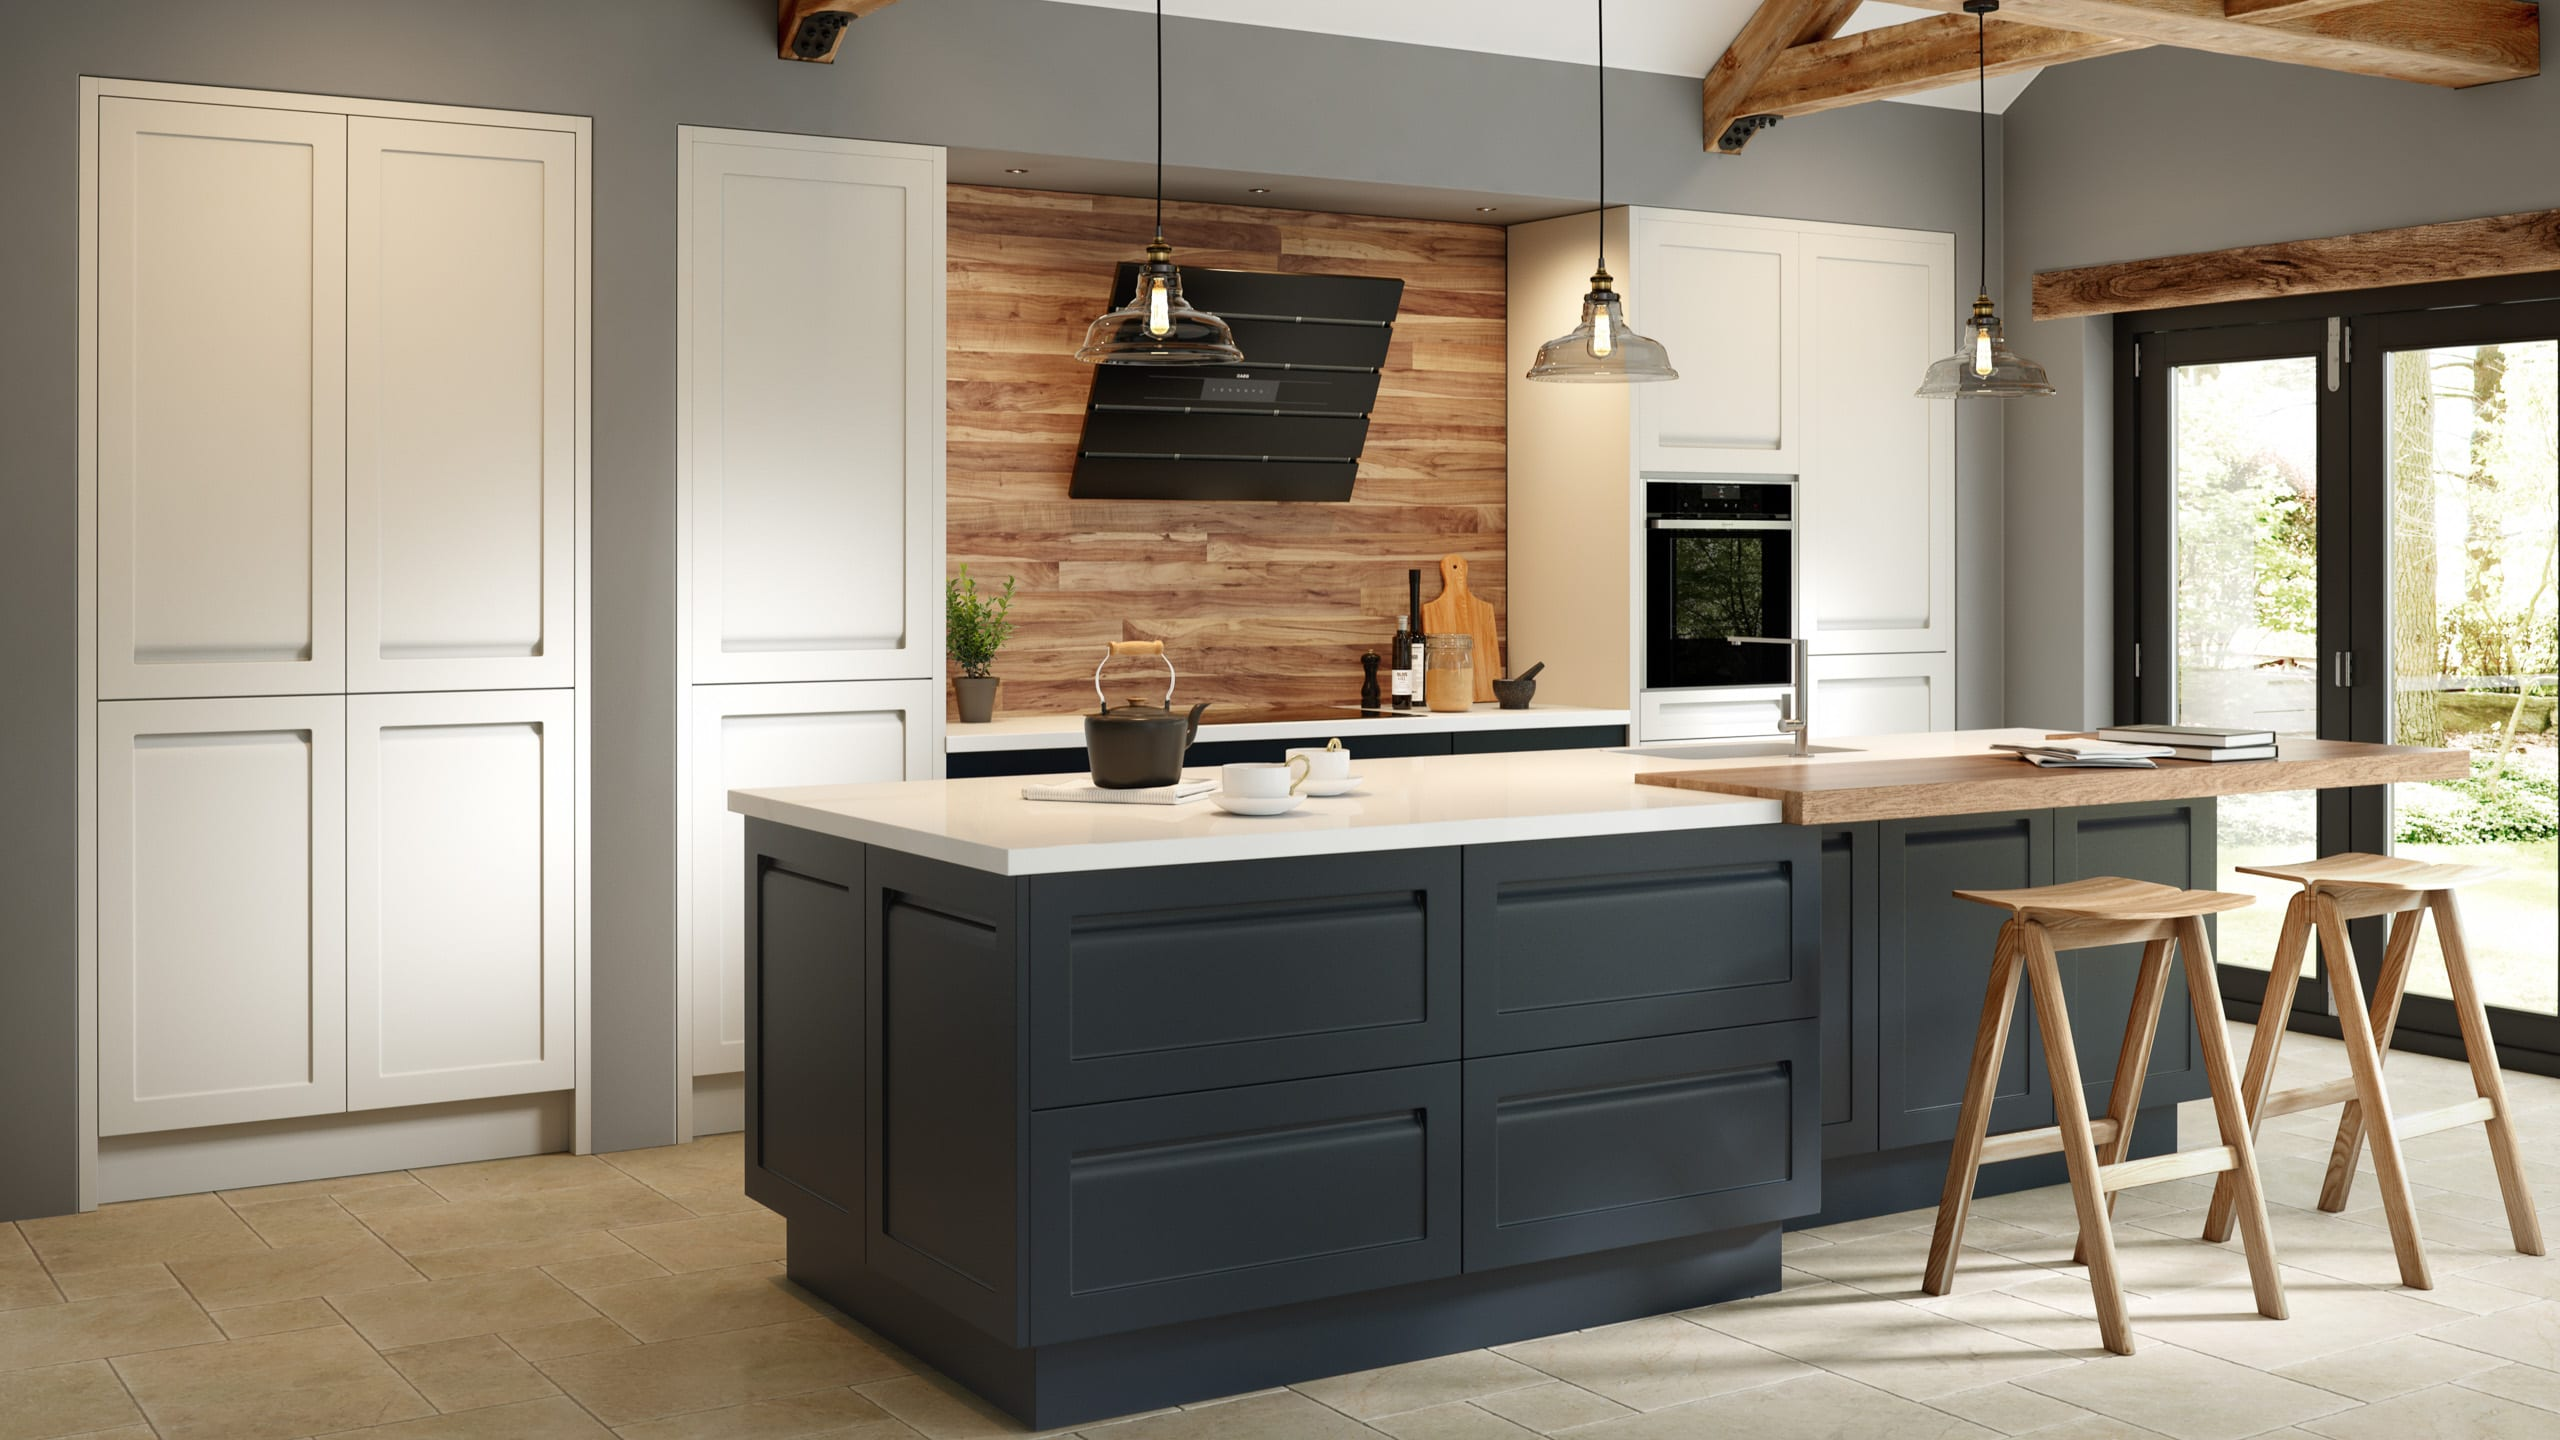 Savoy Painted Limestone - Anthracite - kitchen